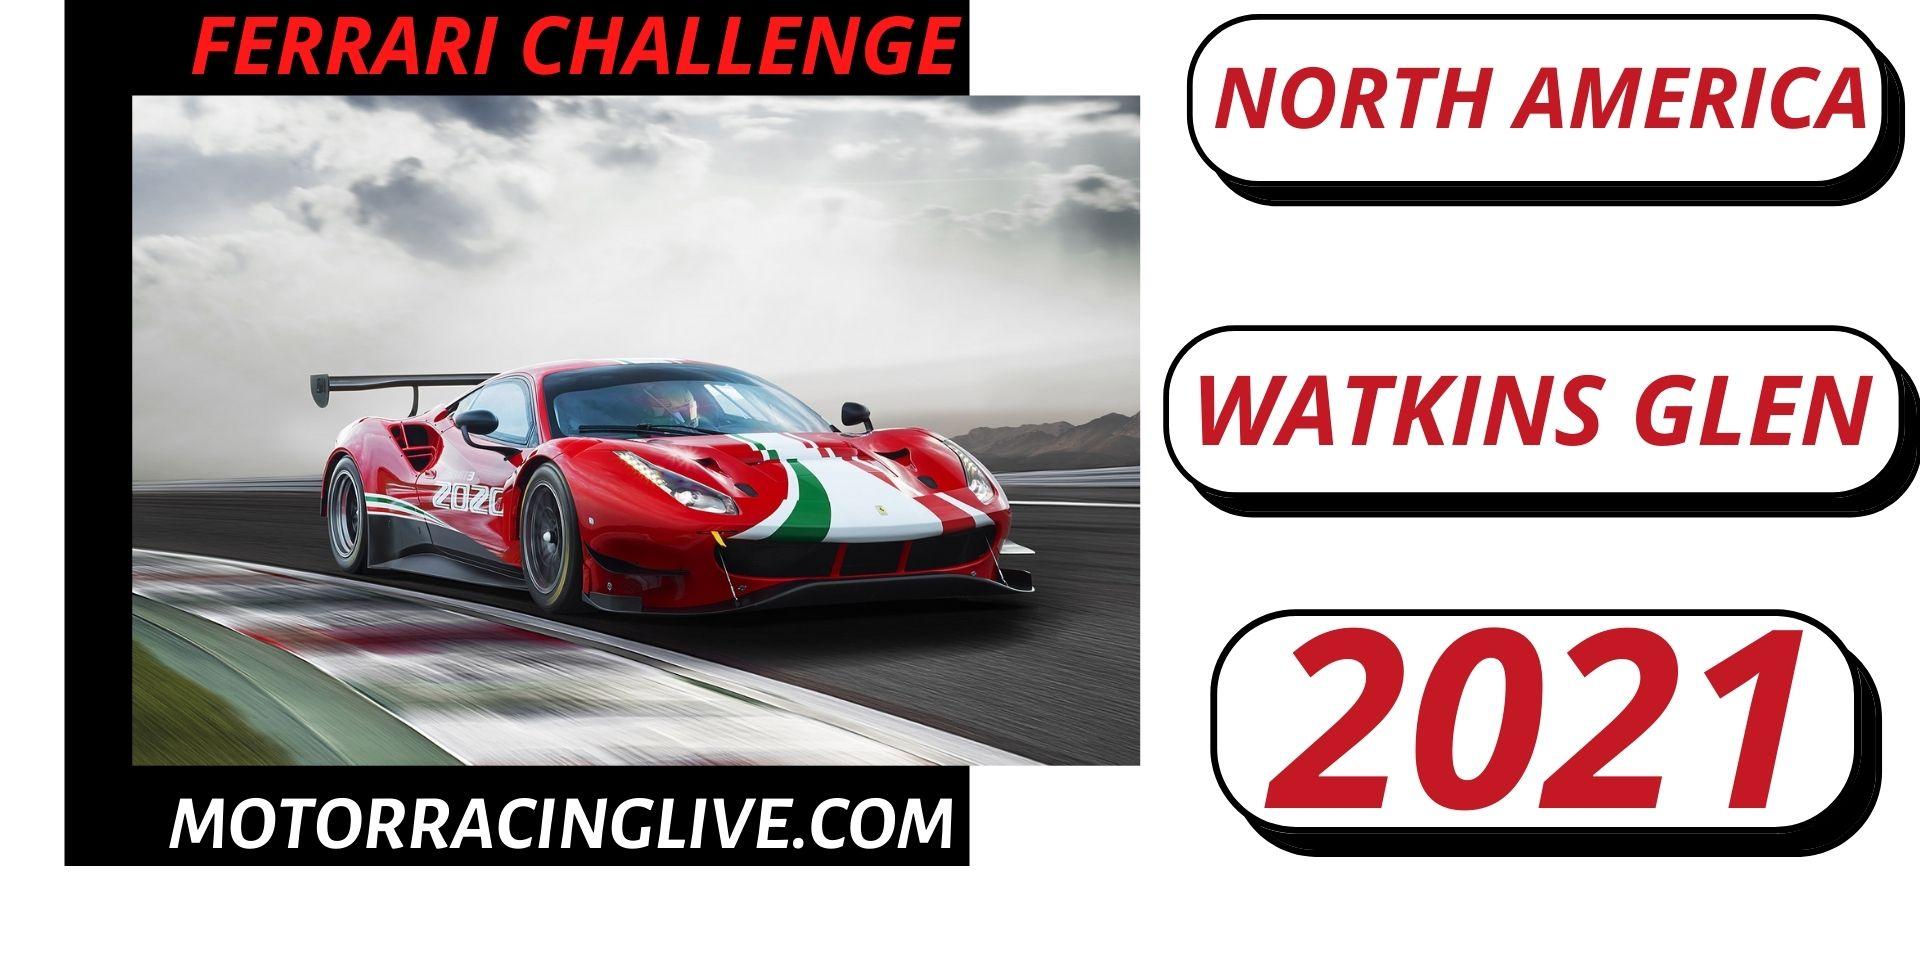 Watkins Glen Ferrari Challenge North America Live 2021